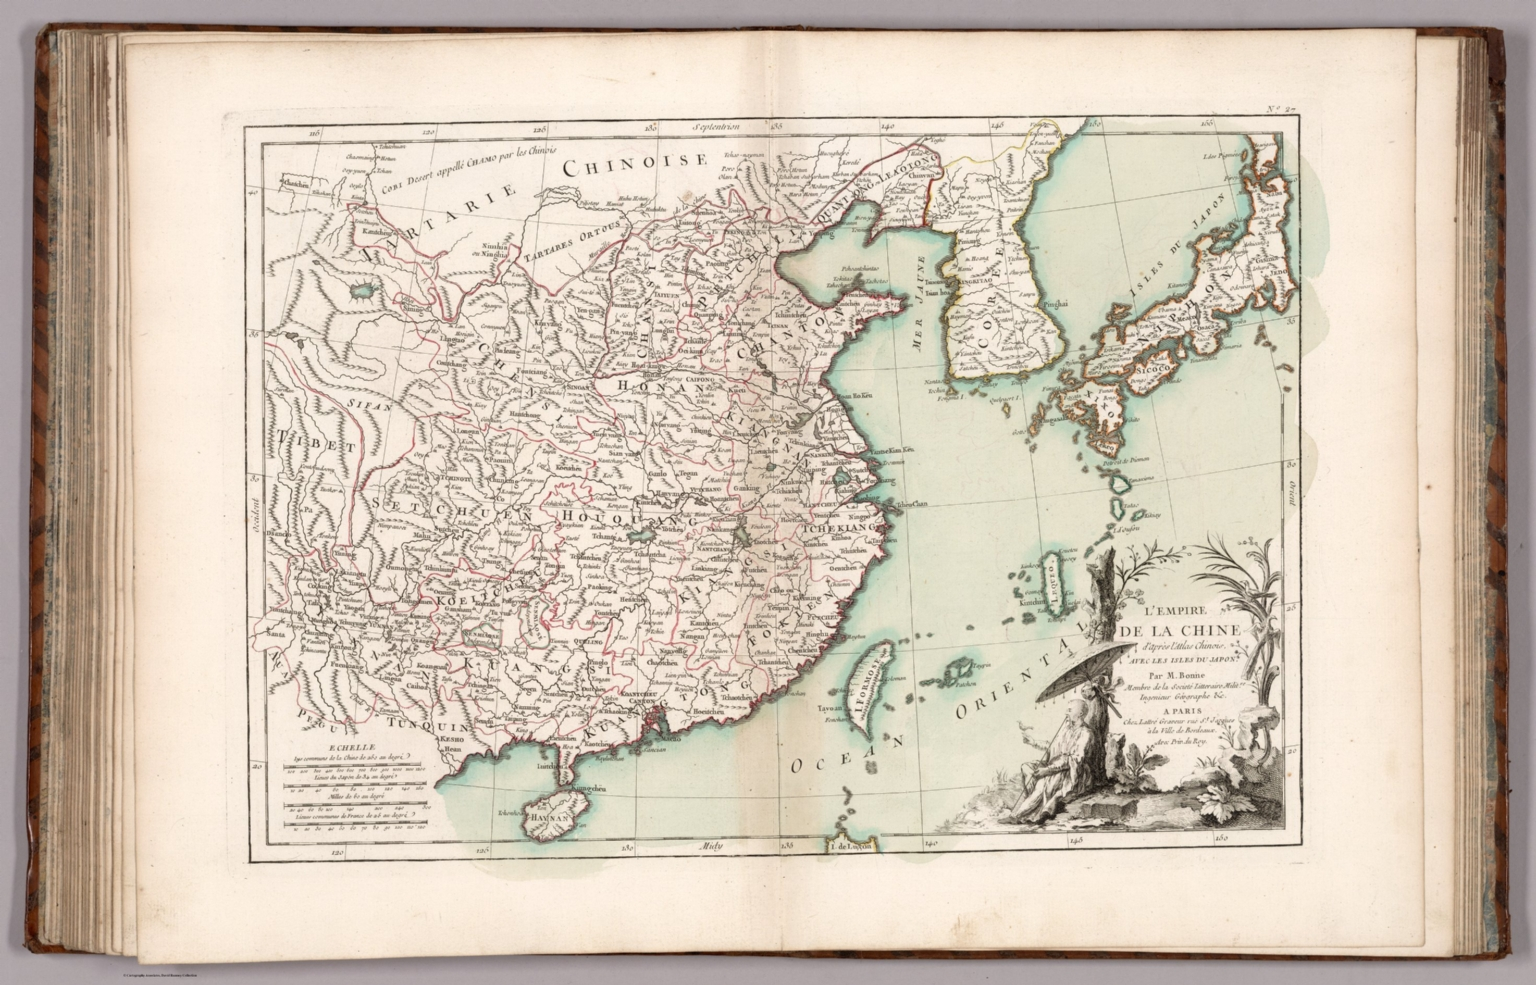 No. 27: L'Empire de la Chine d'apres l'atlas Chinois